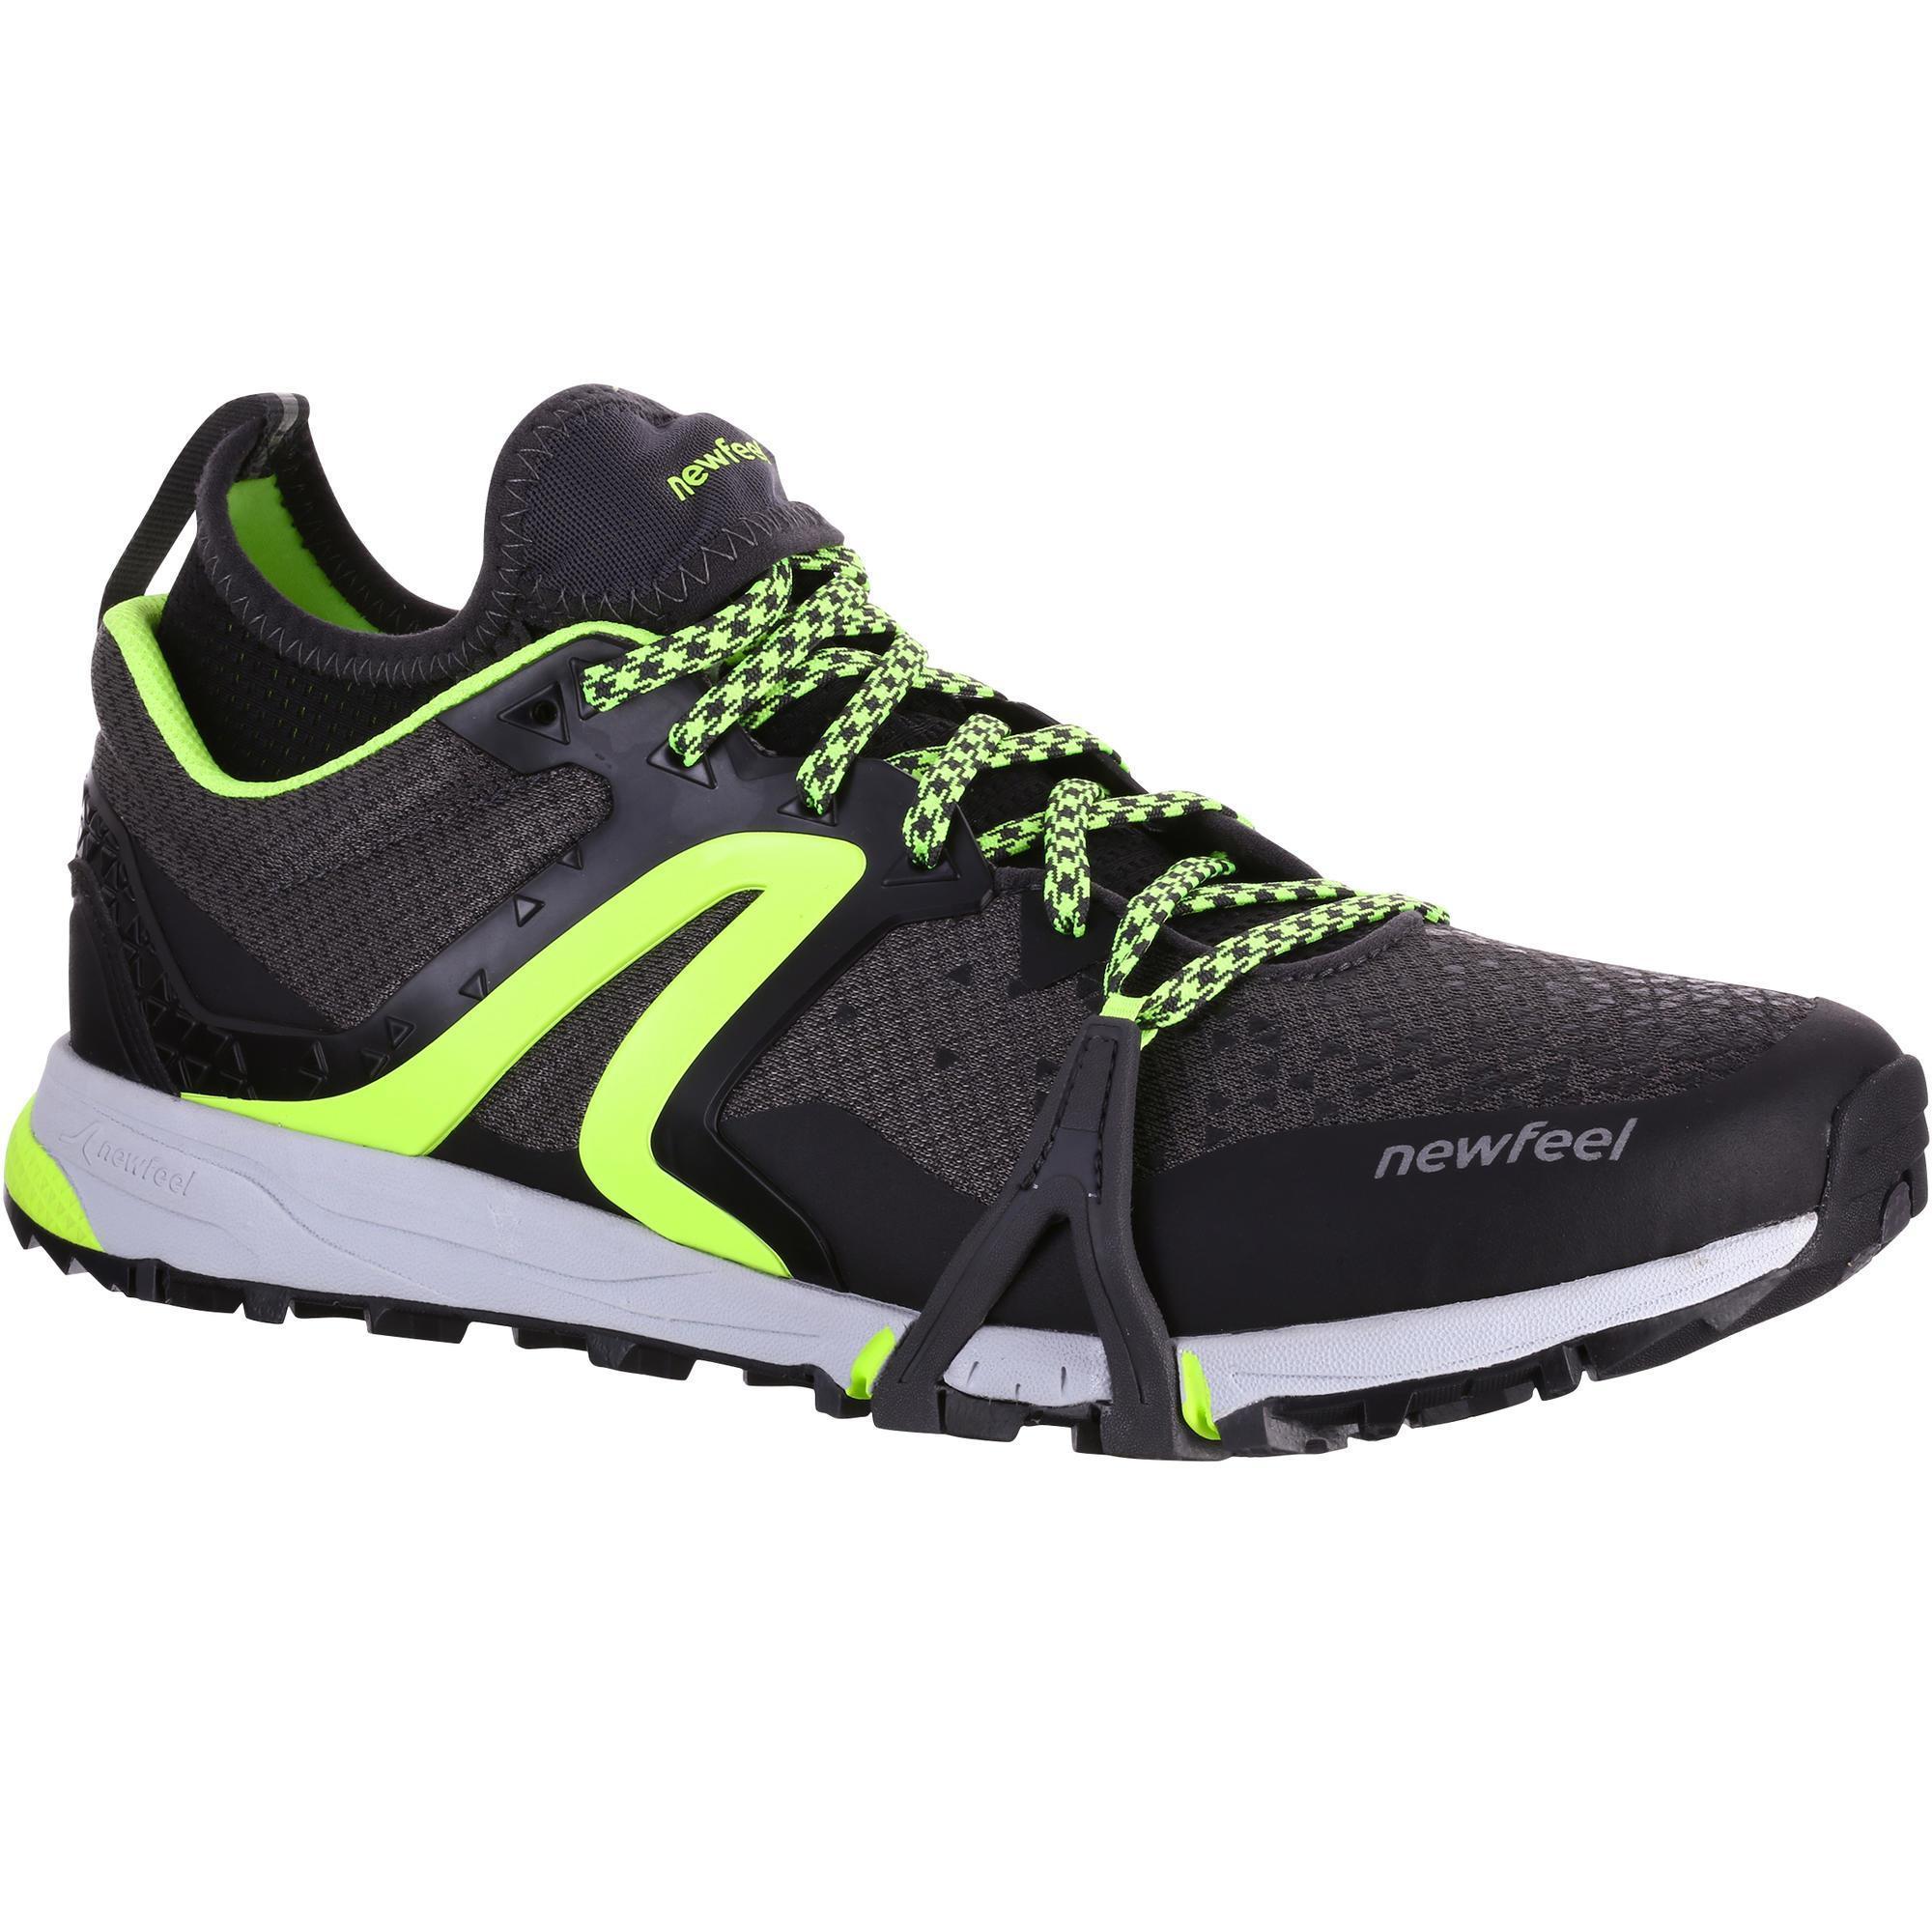 pretty nice 4fe92 b15b7 Sneakers Heren | Decathlon